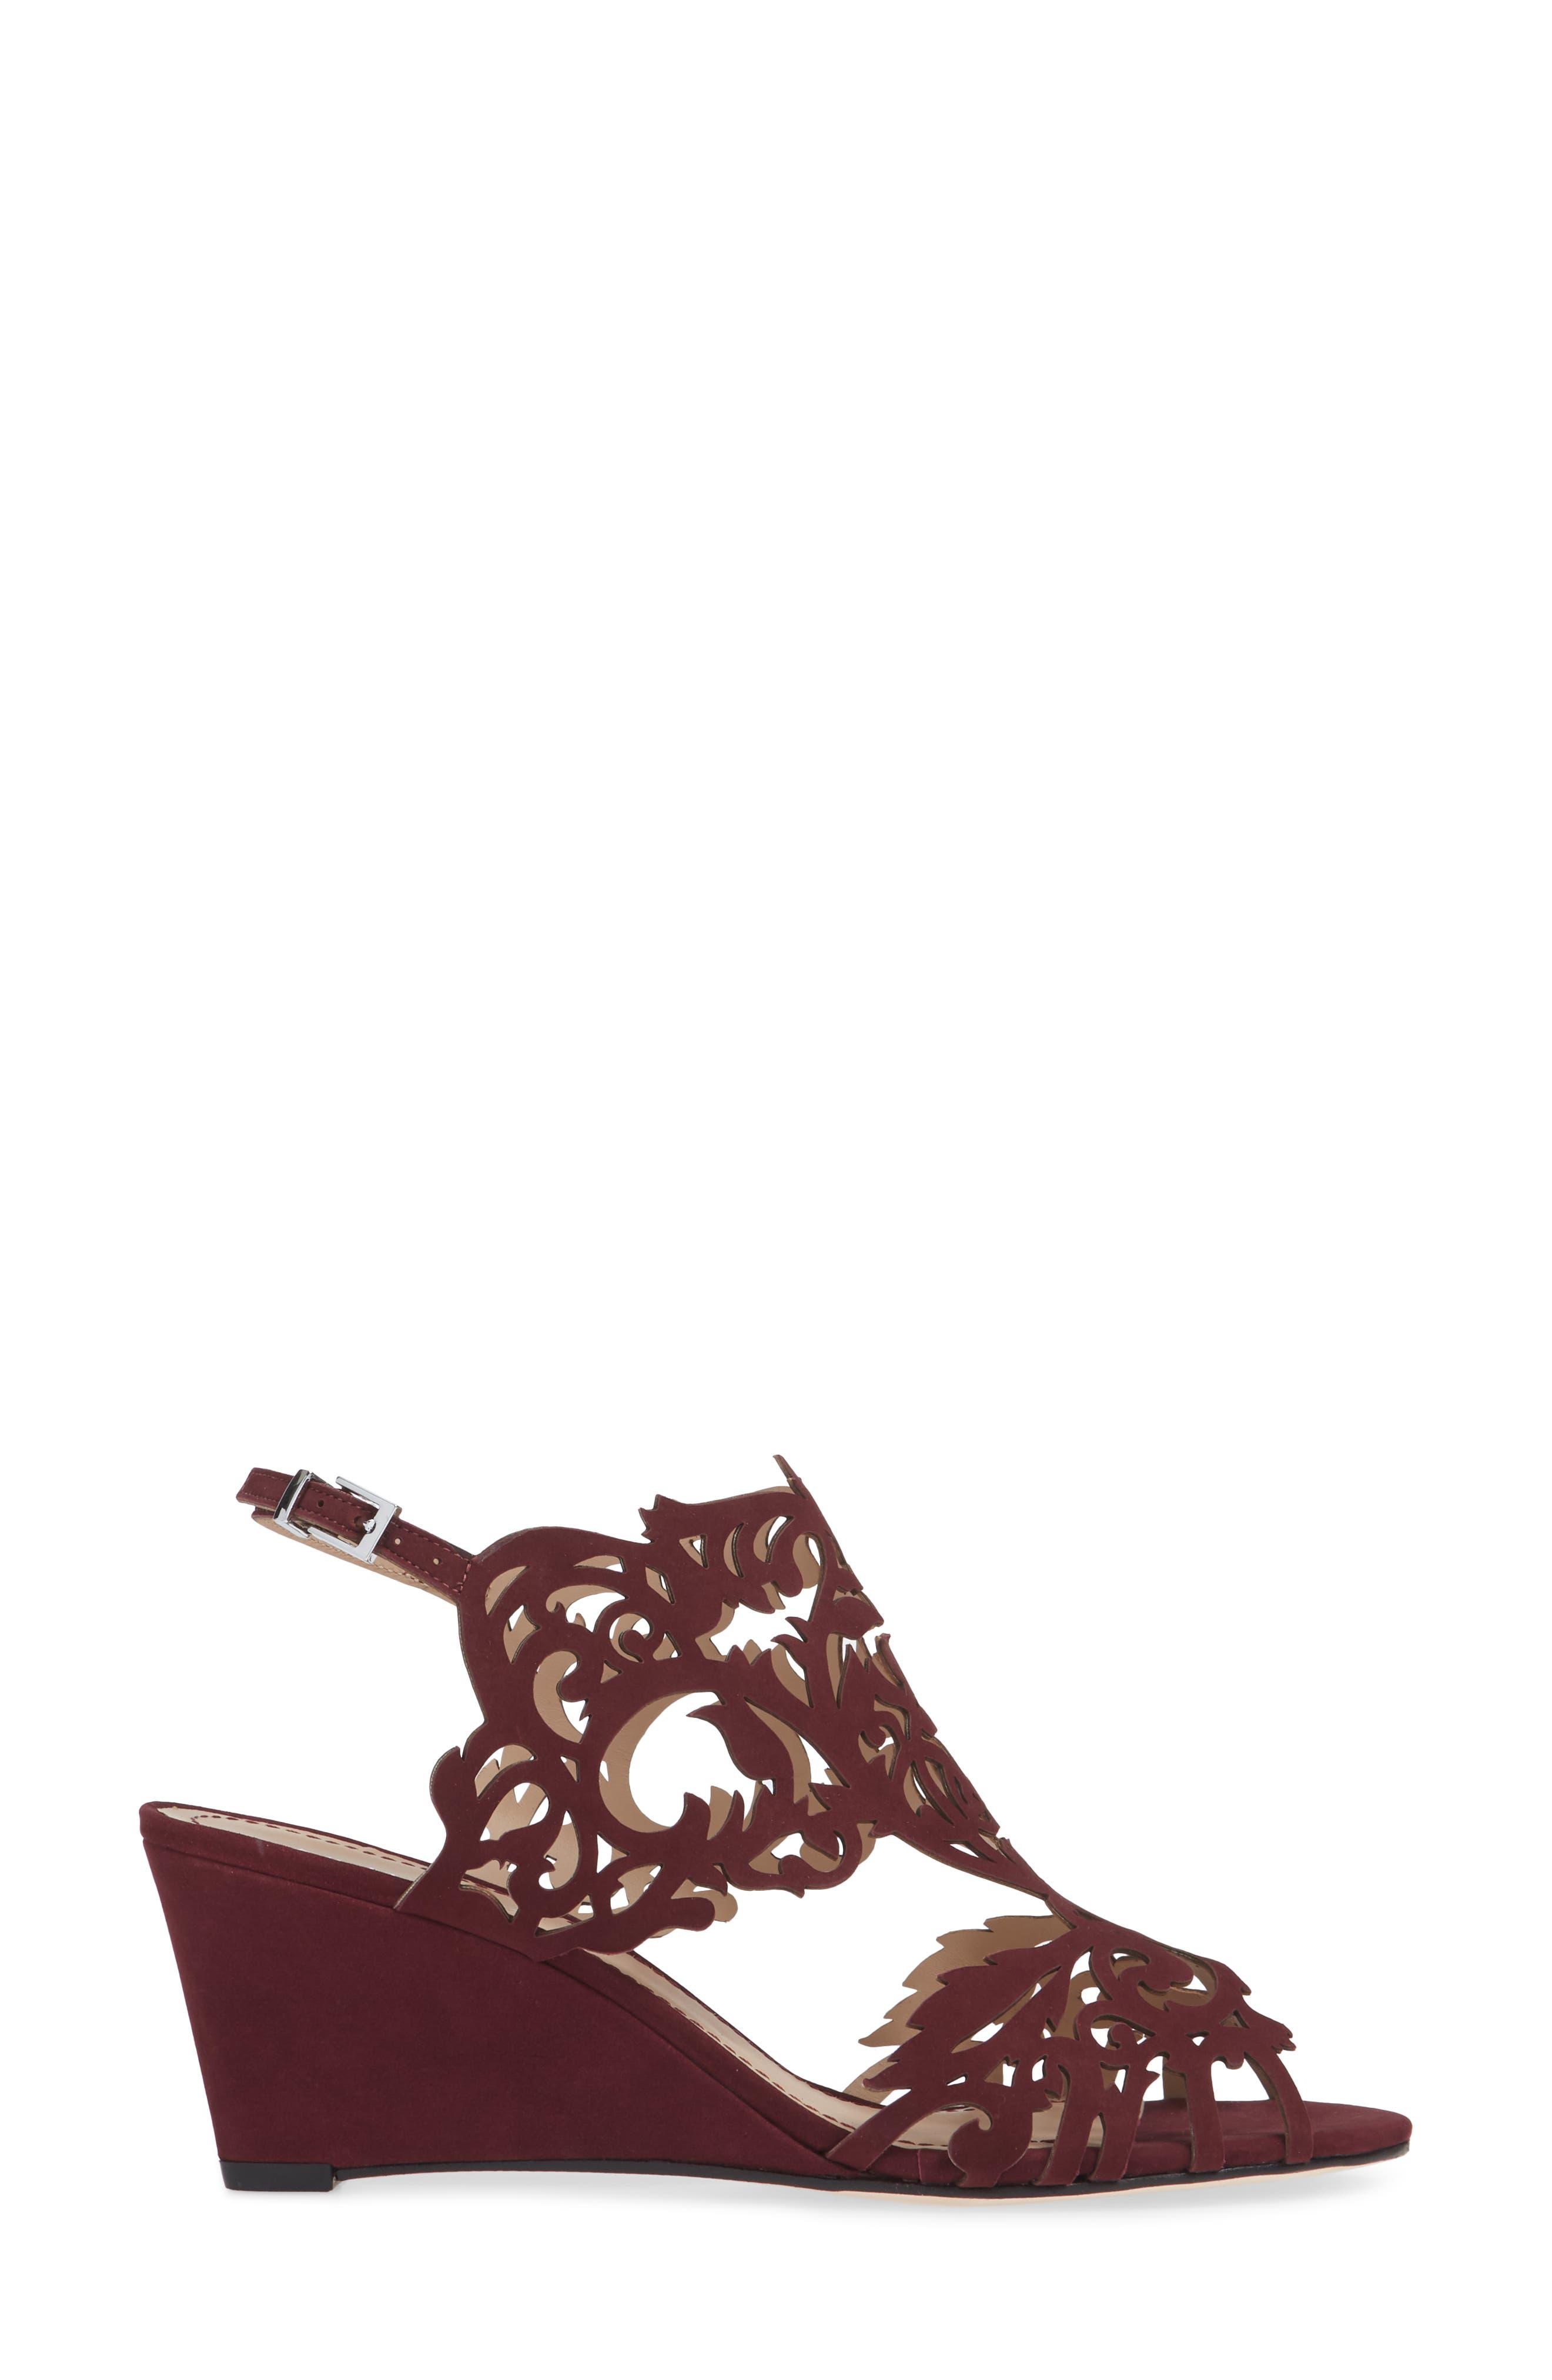 Marcela Laser Cutout Wedge Sandal,                             Alternate thumbnail 3, color,                             WINE LEATHER